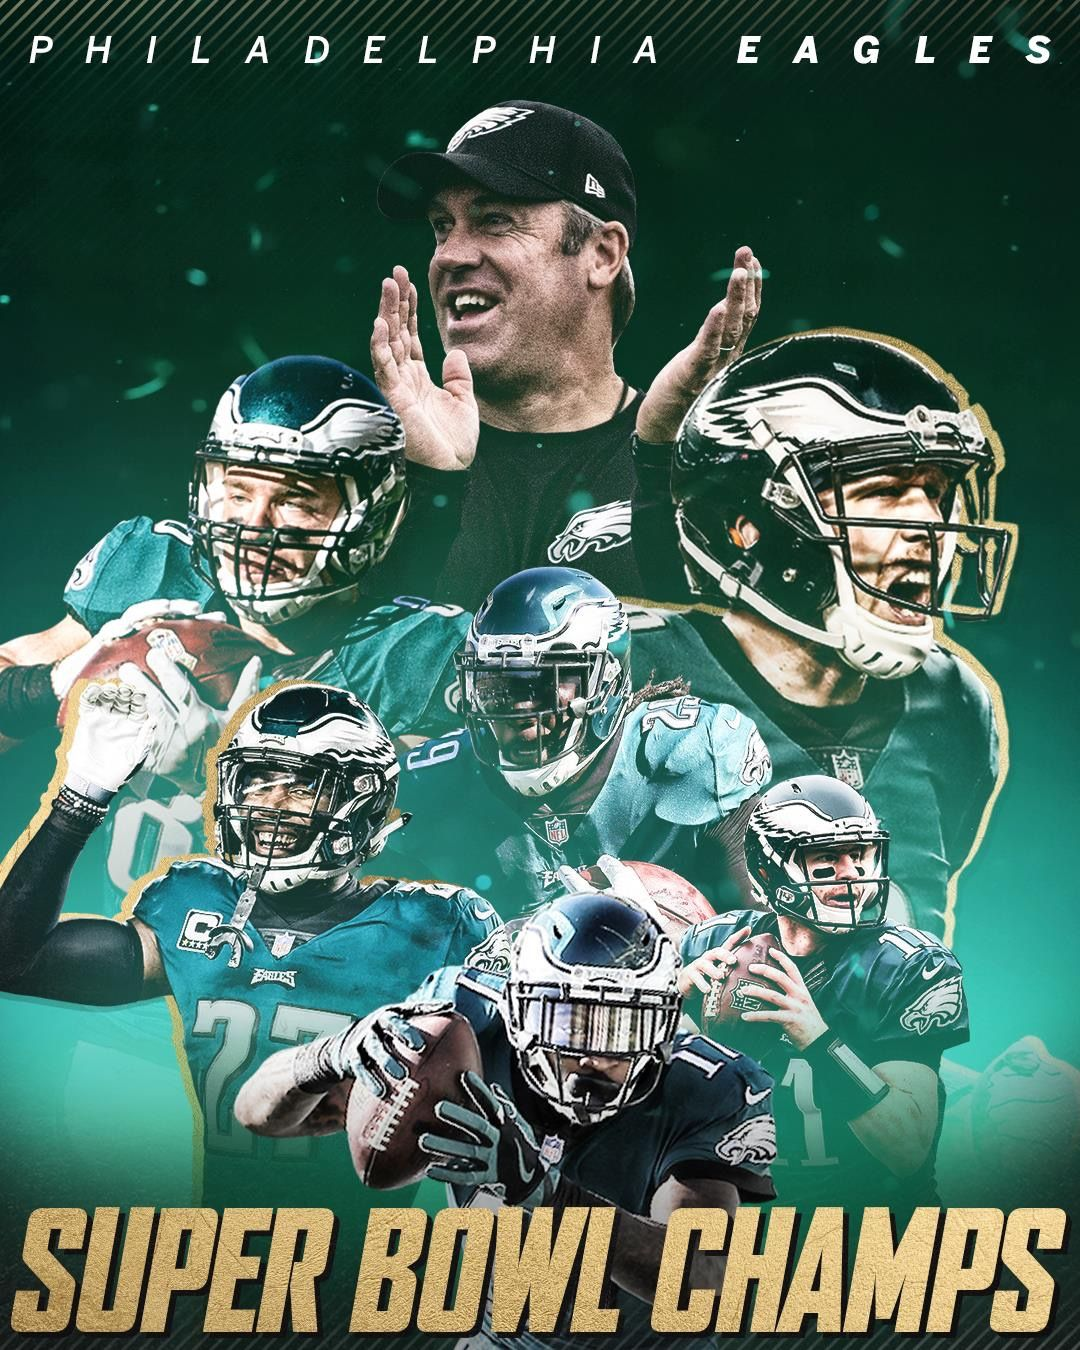 CONGRATS! Philadelphia Eagles for the NFL Super Bowl LII